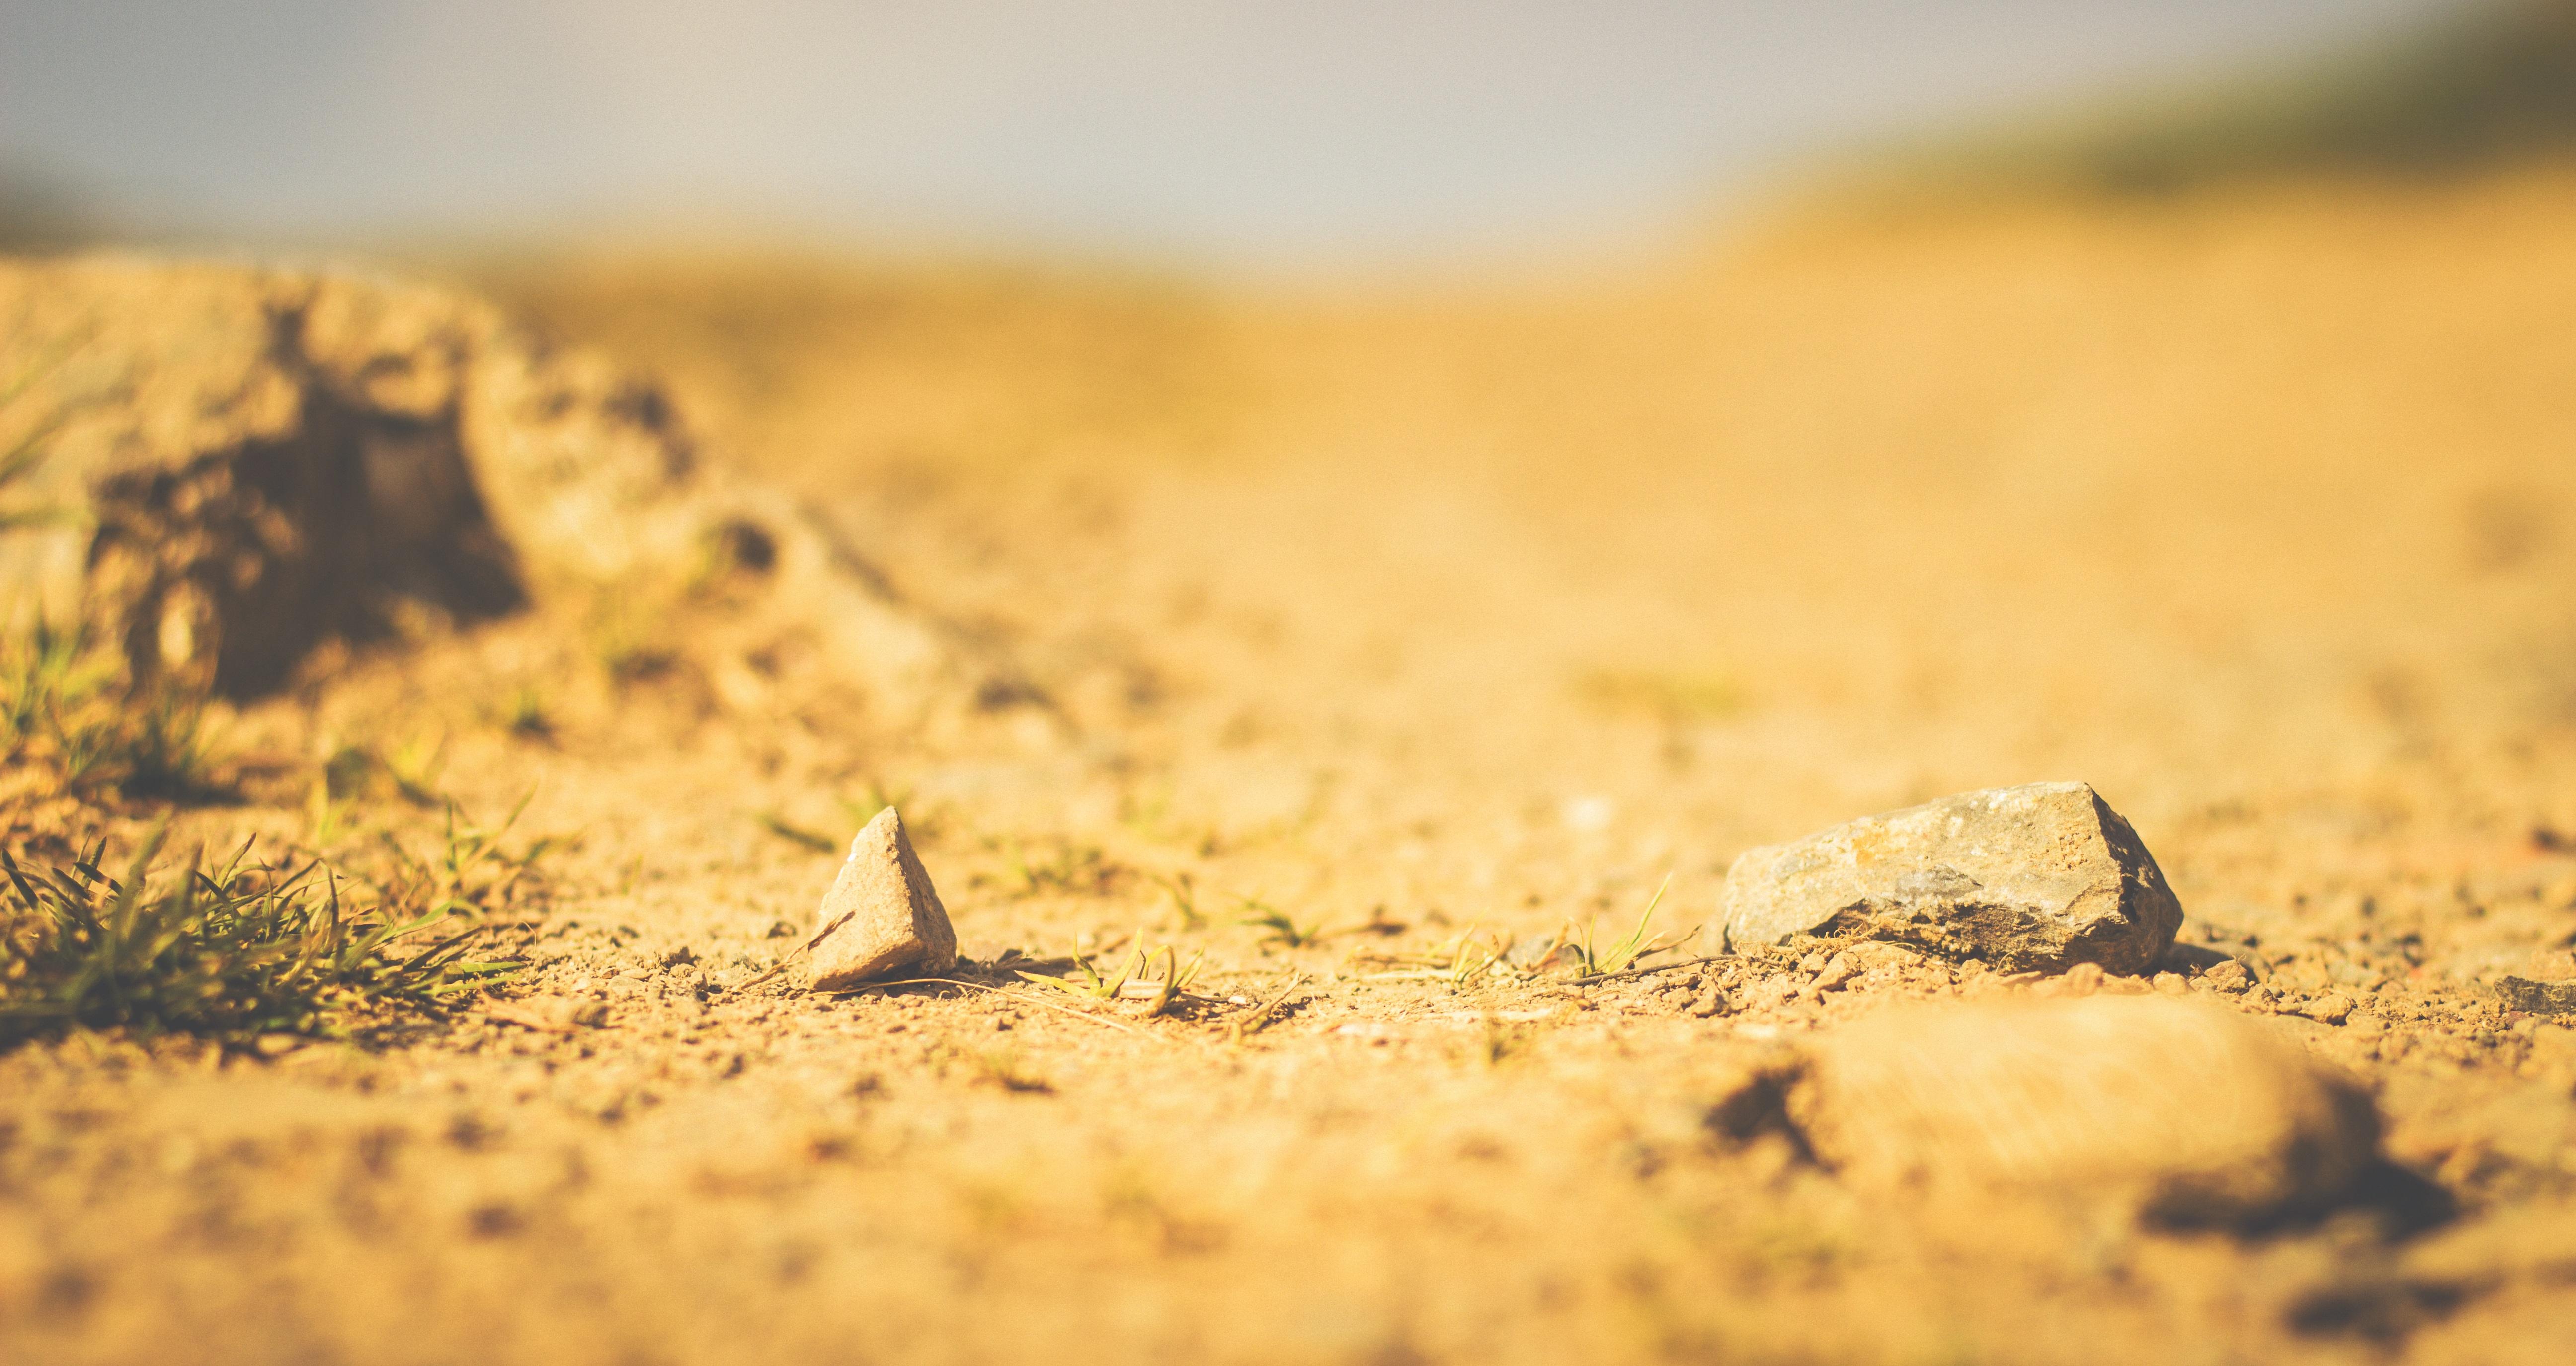 Free Images : landscape, nature, sand, rock, sun, sunset